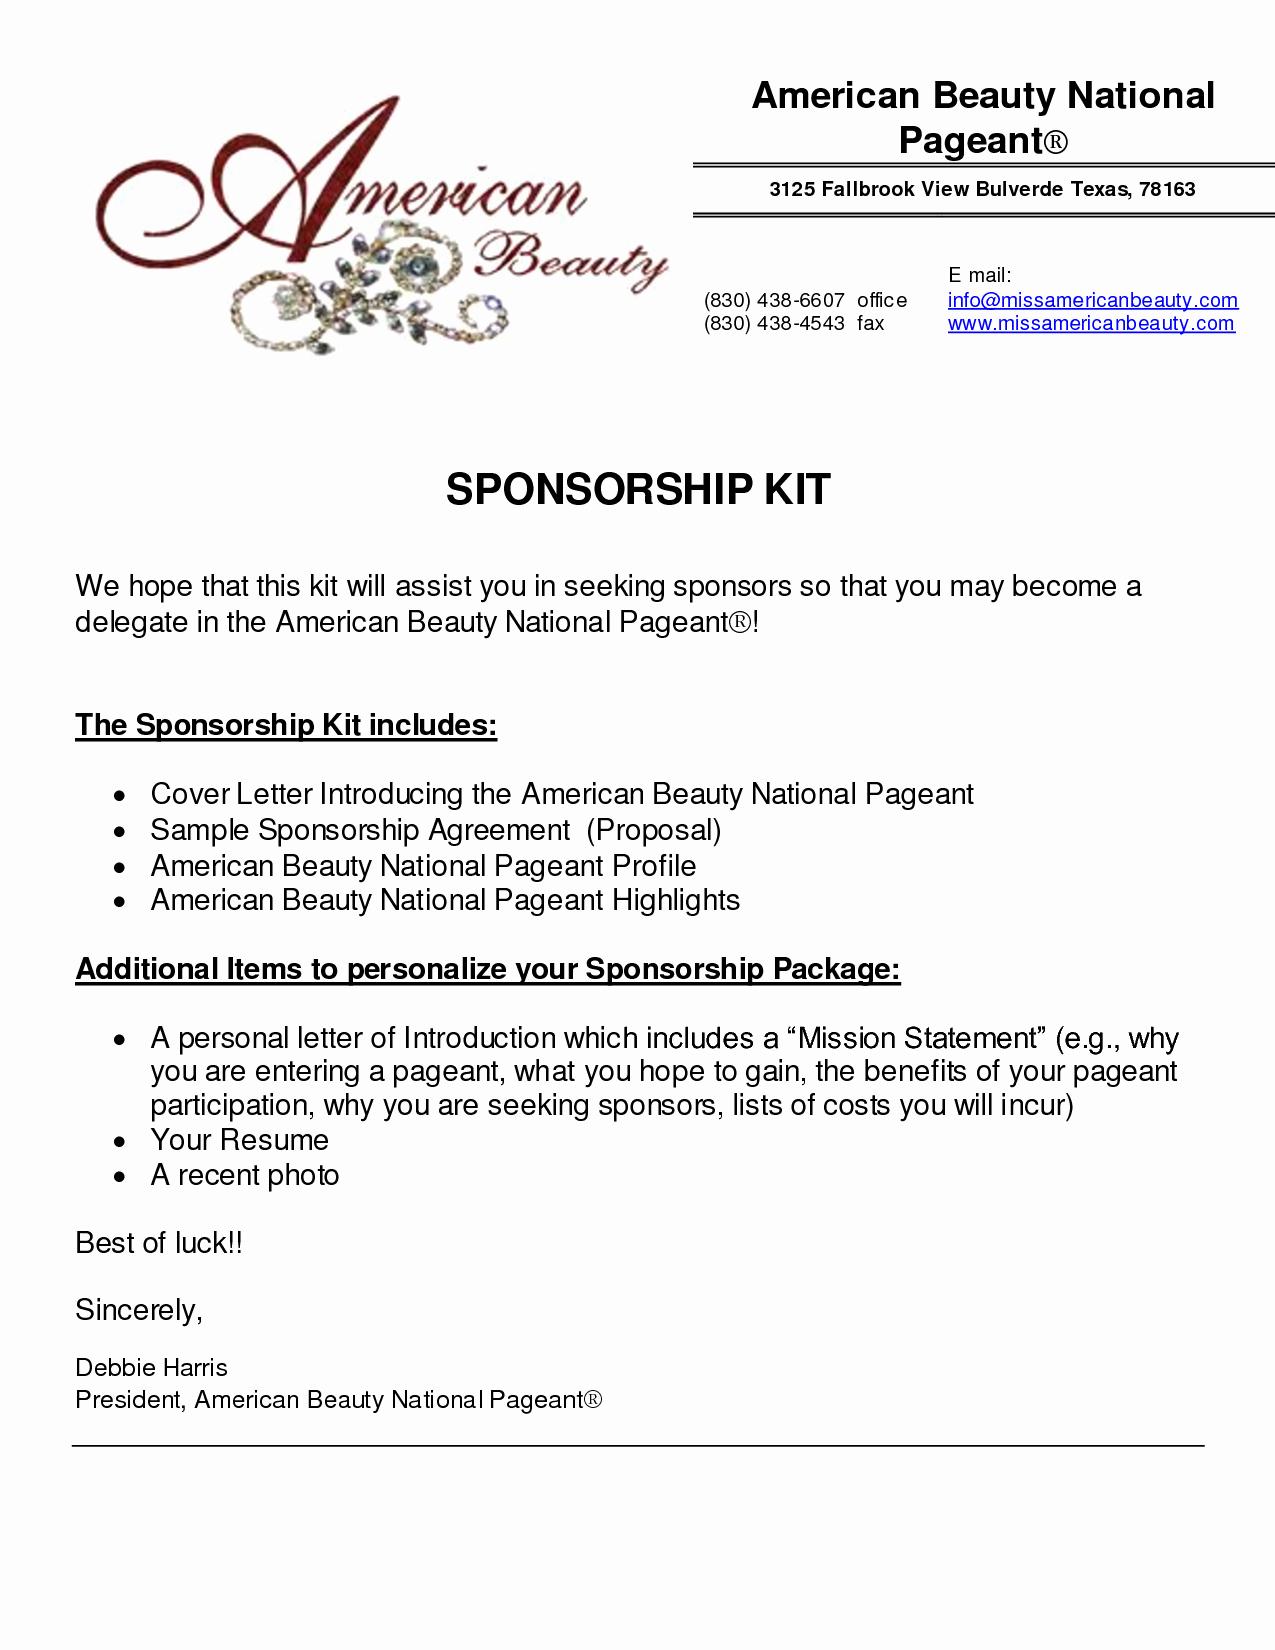 Sponsorship Package Template Free Fresh 6 Sponsorship Proposal Templates Excel Pdf formats